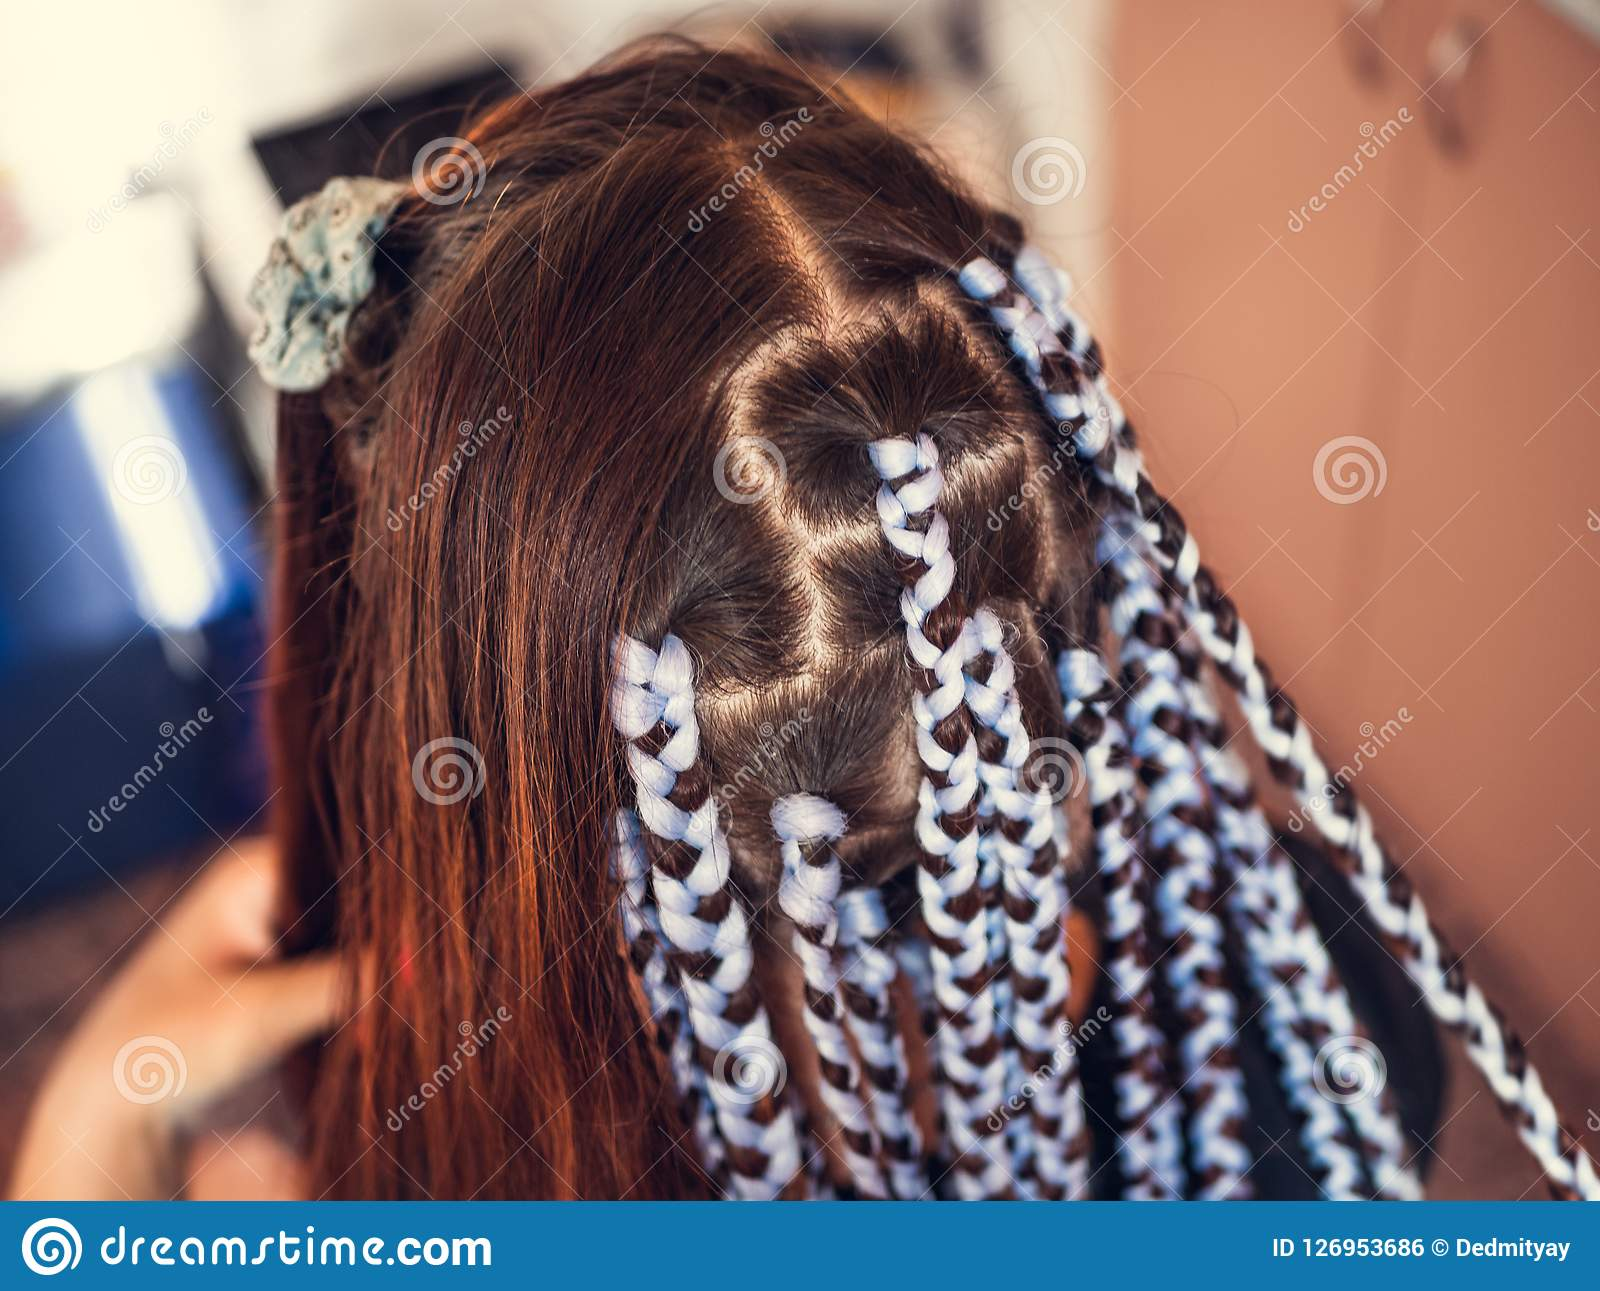 Awe Inspiring Hairdresser Weaves Braids With Kanekalon Material To Young Girl Schematic Wiring Diagrams Amerangerunnerswayorg